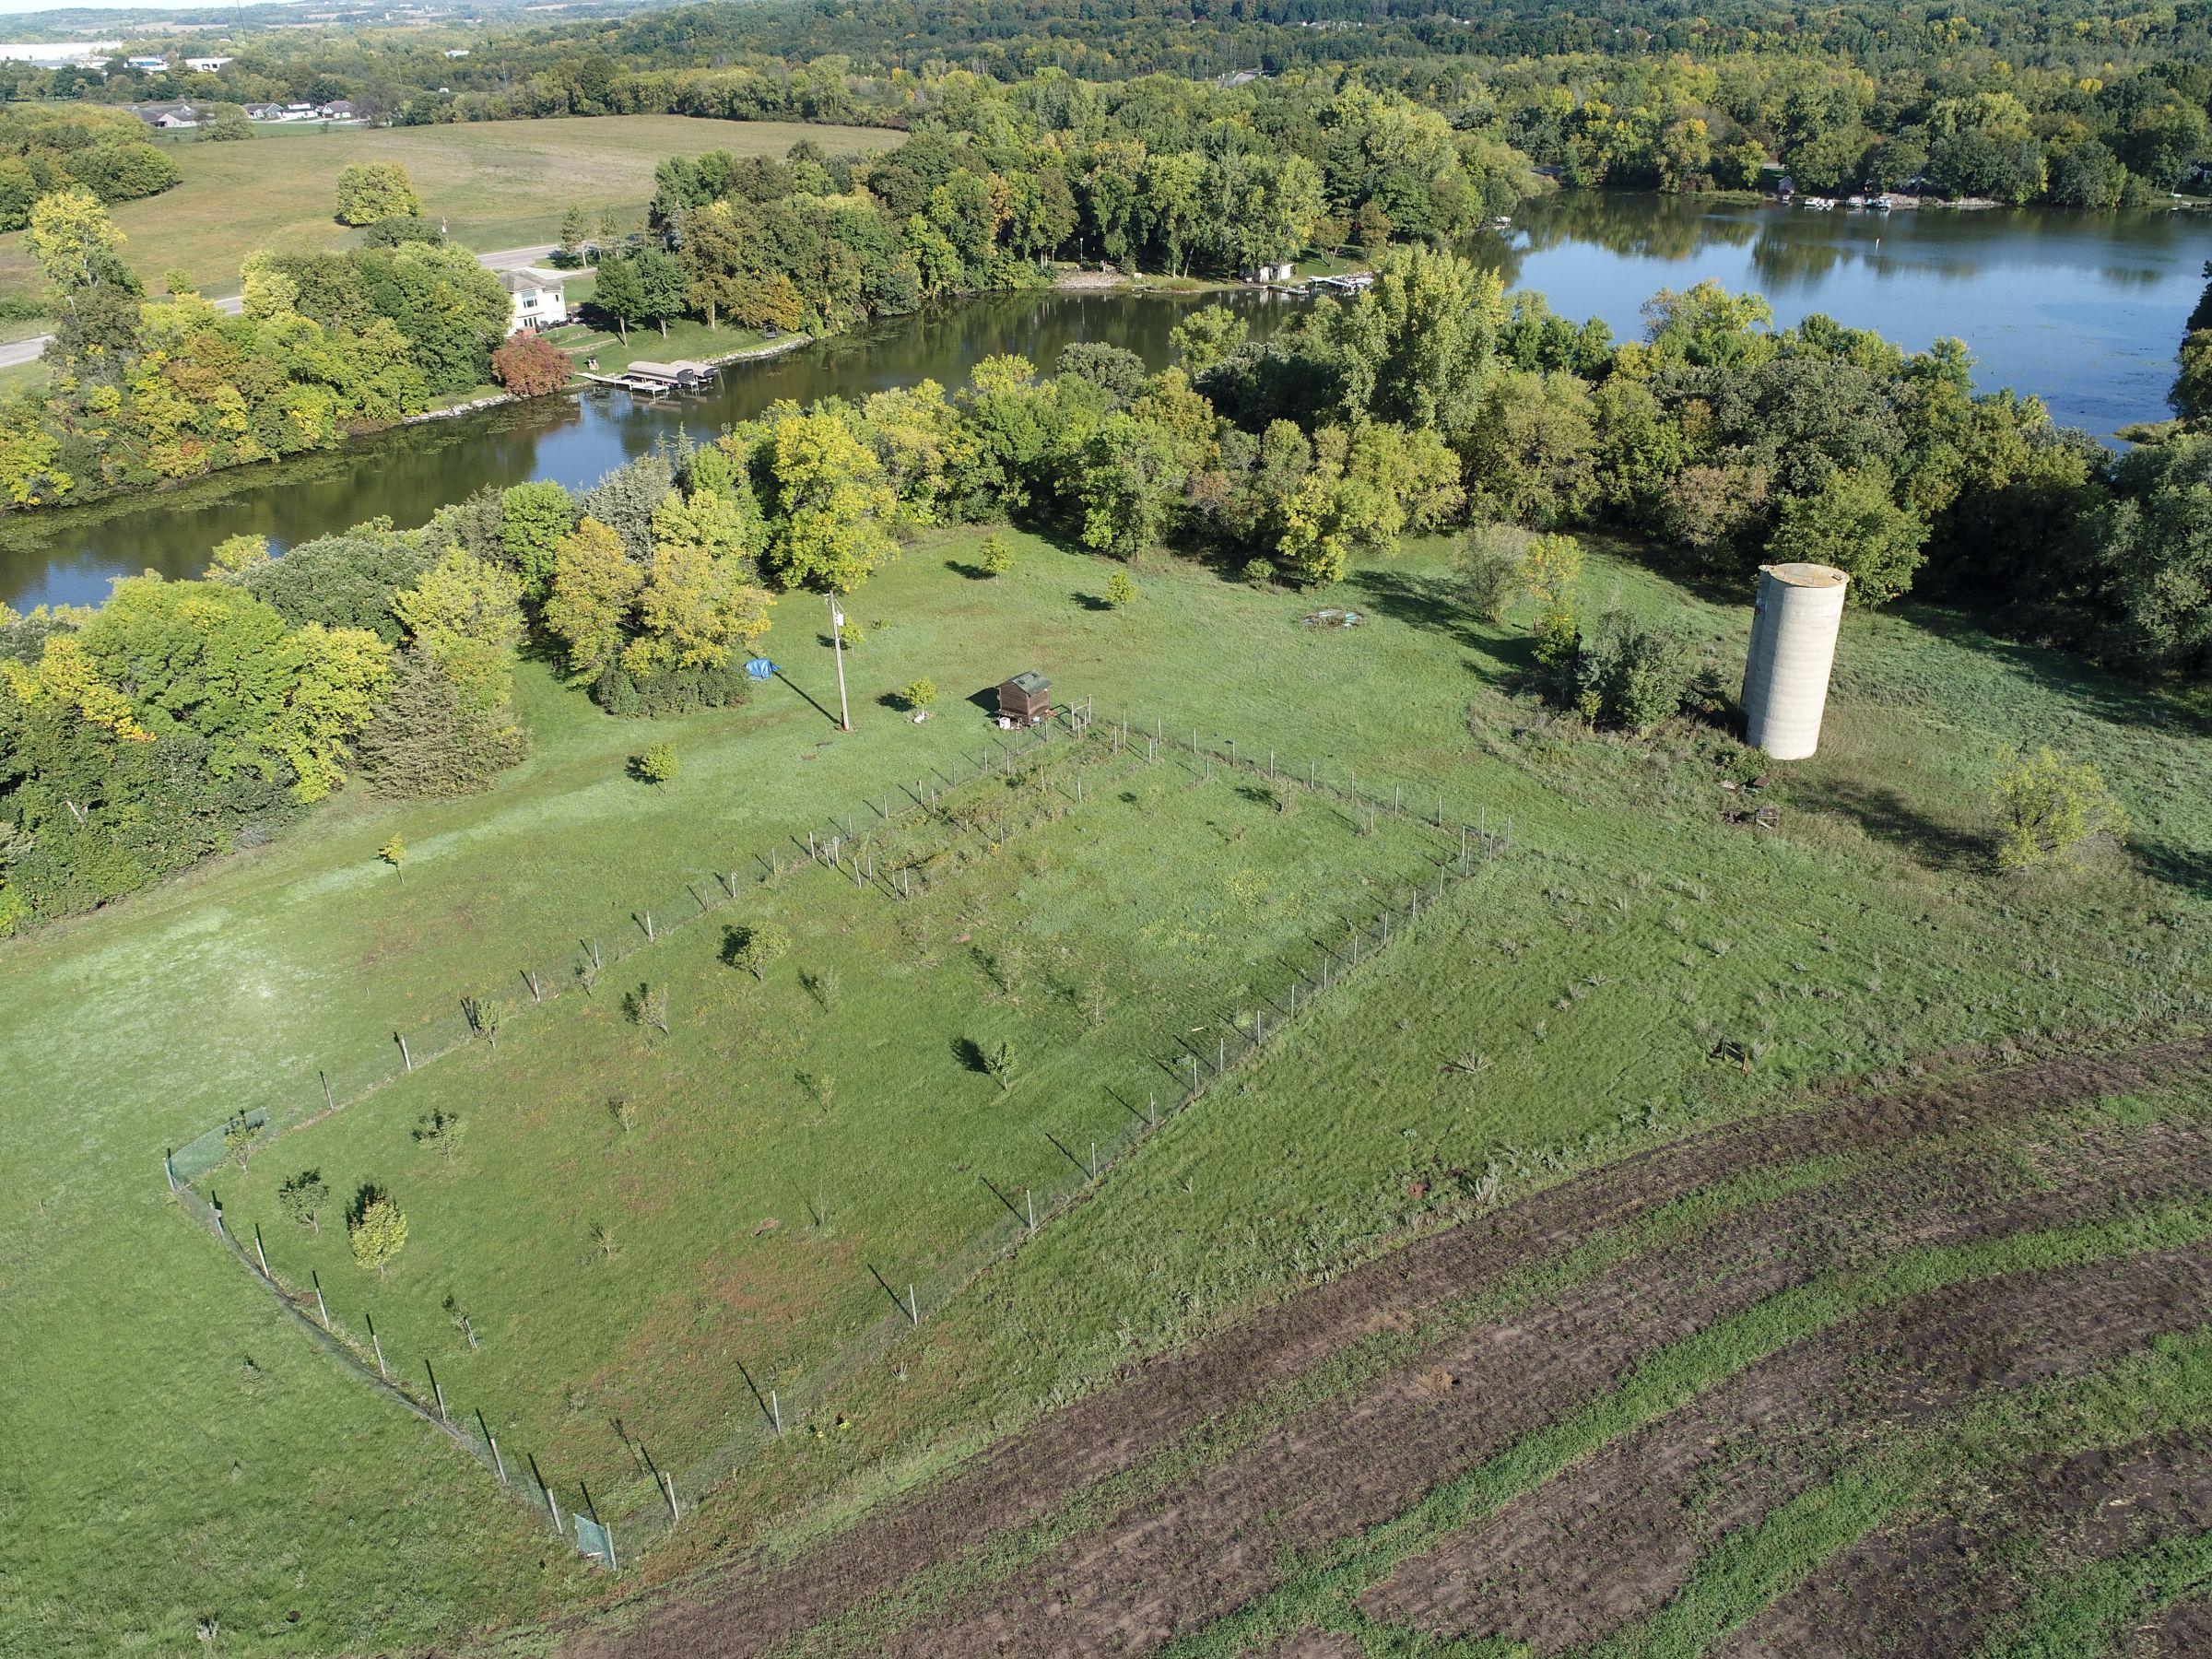 land-stearns-county-minnesota-298-acres-listing-number-15712-1-2021-09-23-124324.JPG